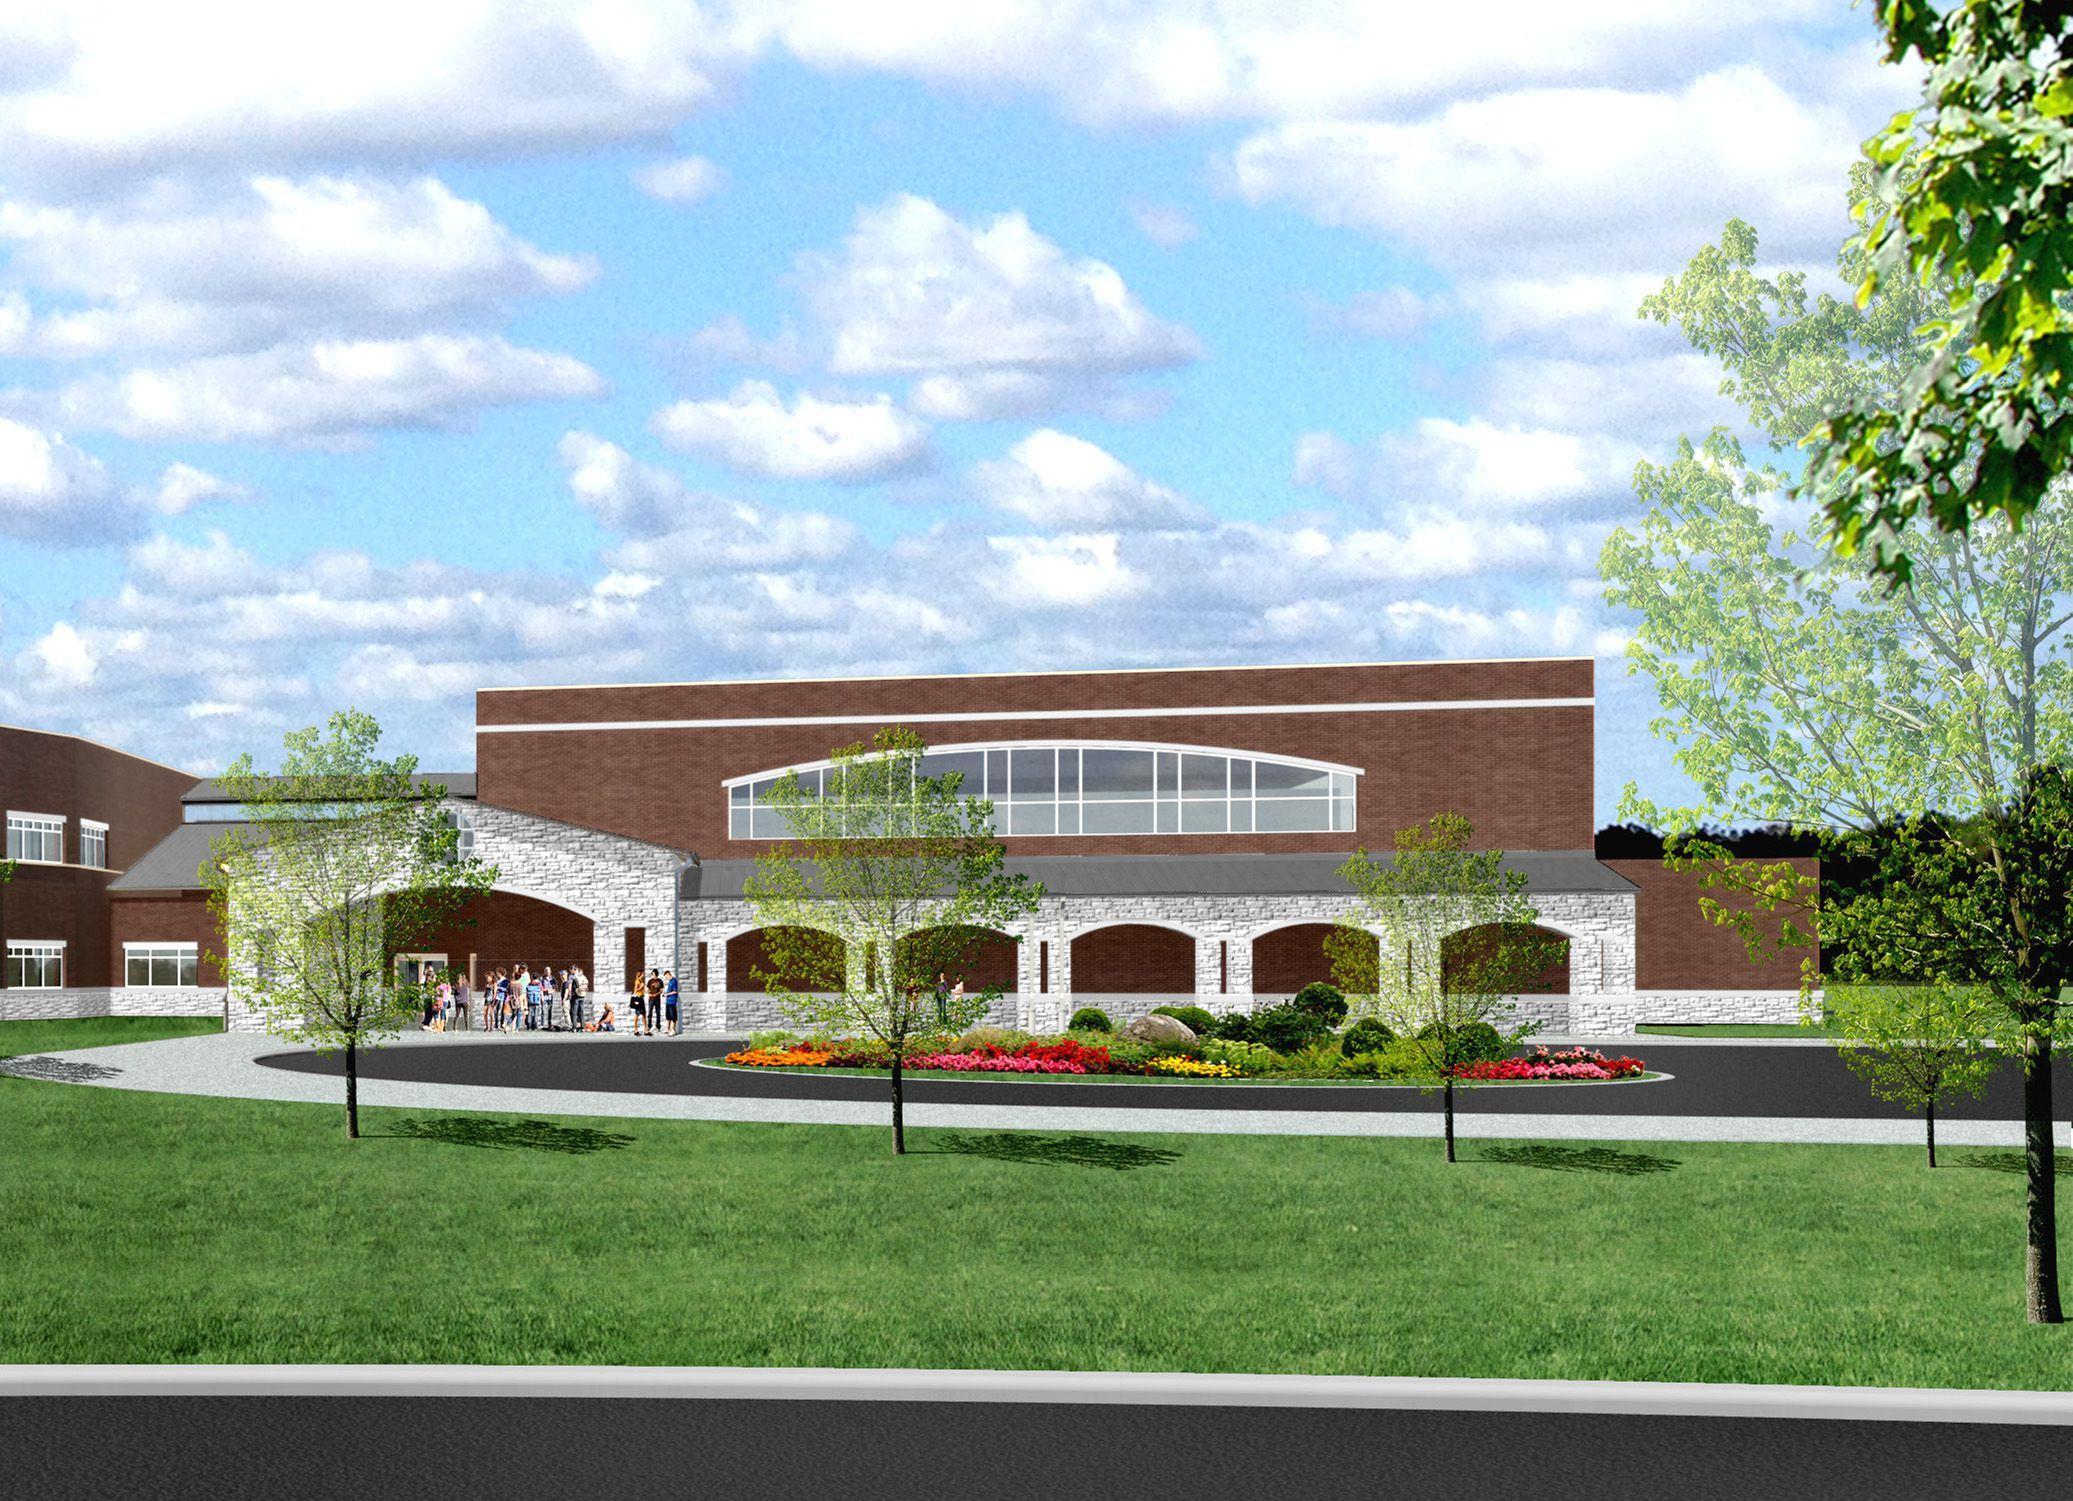 Jennings Creek Elementary architect's rendering.  ShermanCarterBranhartArchitects